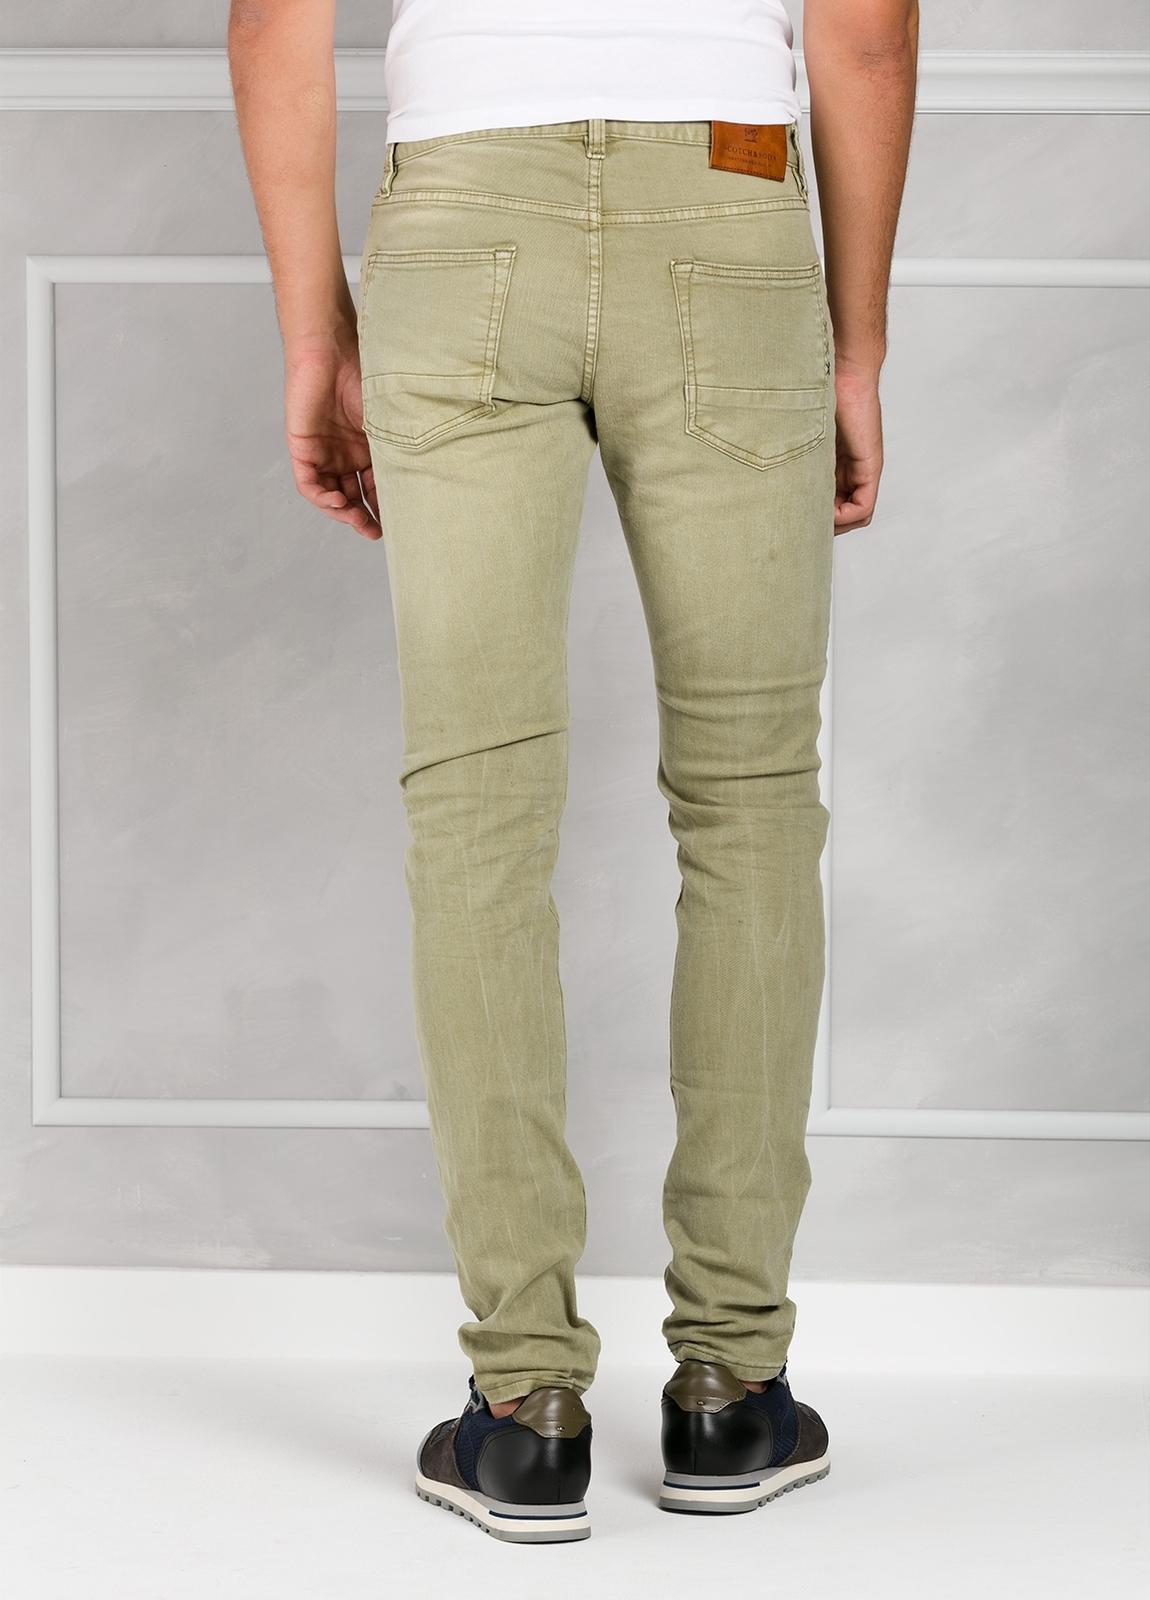 Pantalón 5 bolsillos regular slim fit denim elástico teñido en prenda color verde. 90% Algodón 8% Poliéster 2% Elastano. - Ítem1